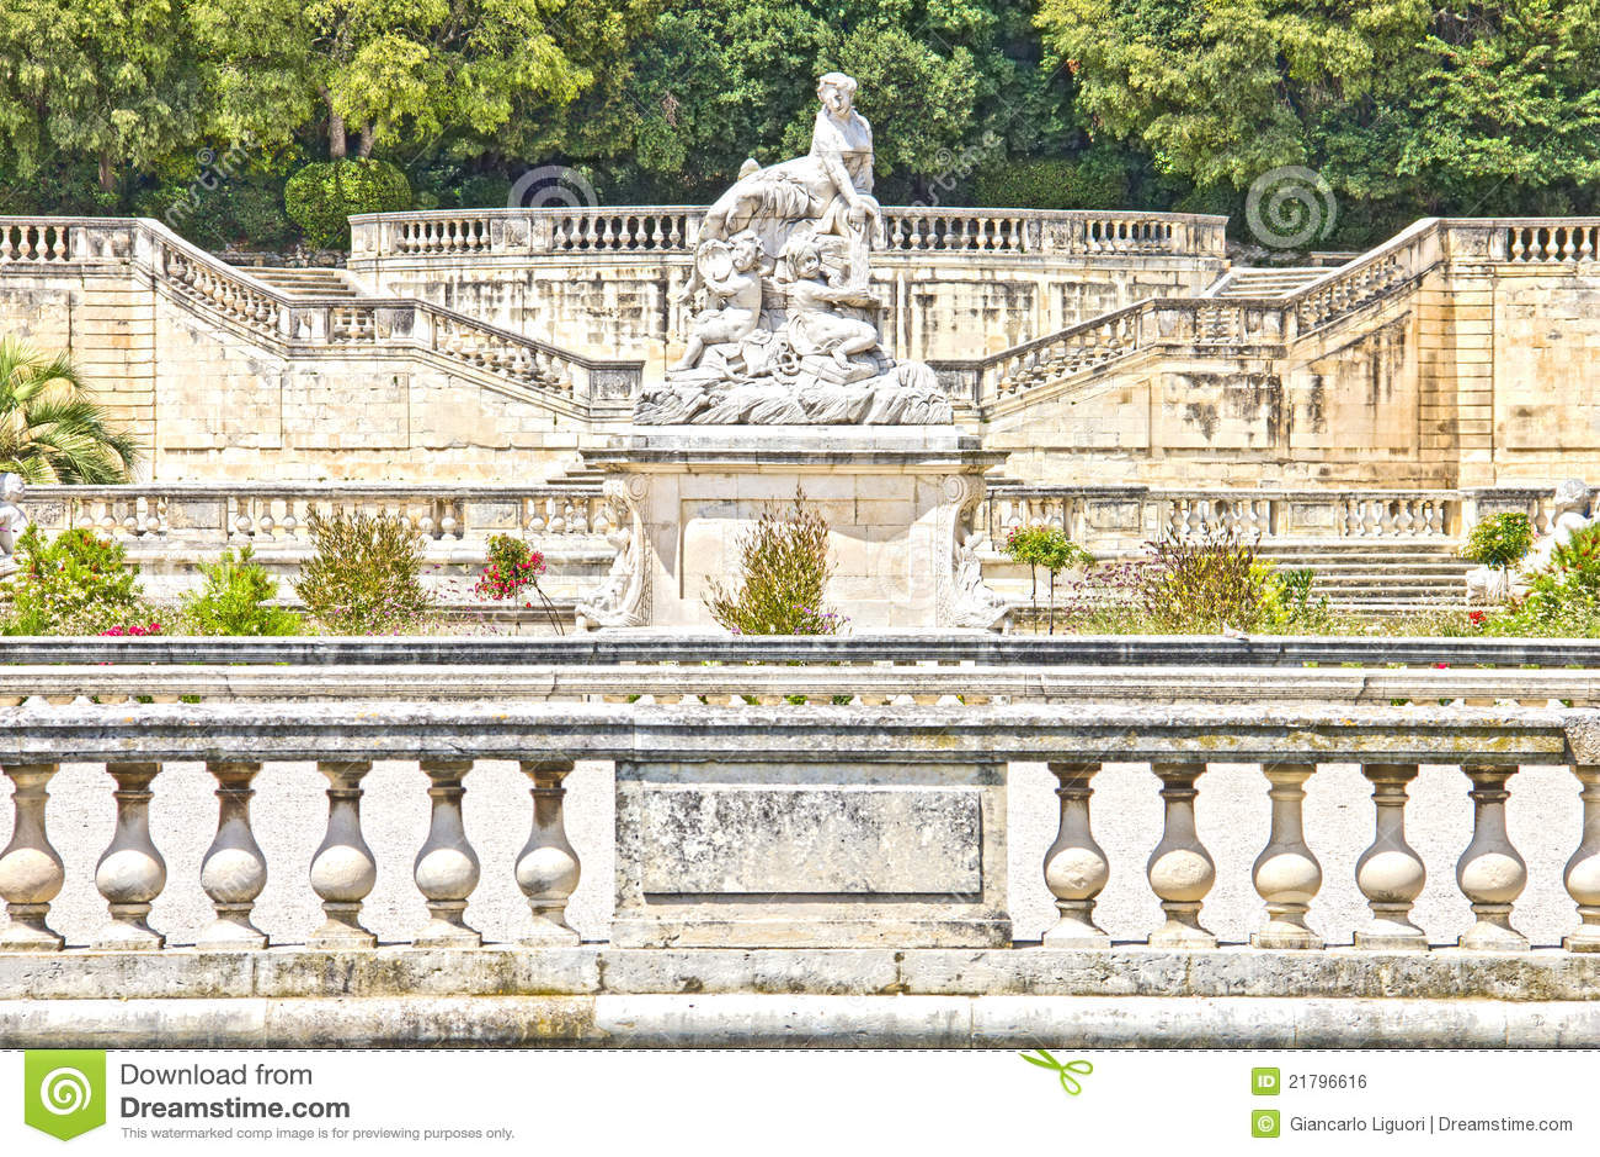 park jardin de la fontaine in nimes royalty free stock image image 21796616. Black Bedroom Furniture Sets. Home Design Ideas